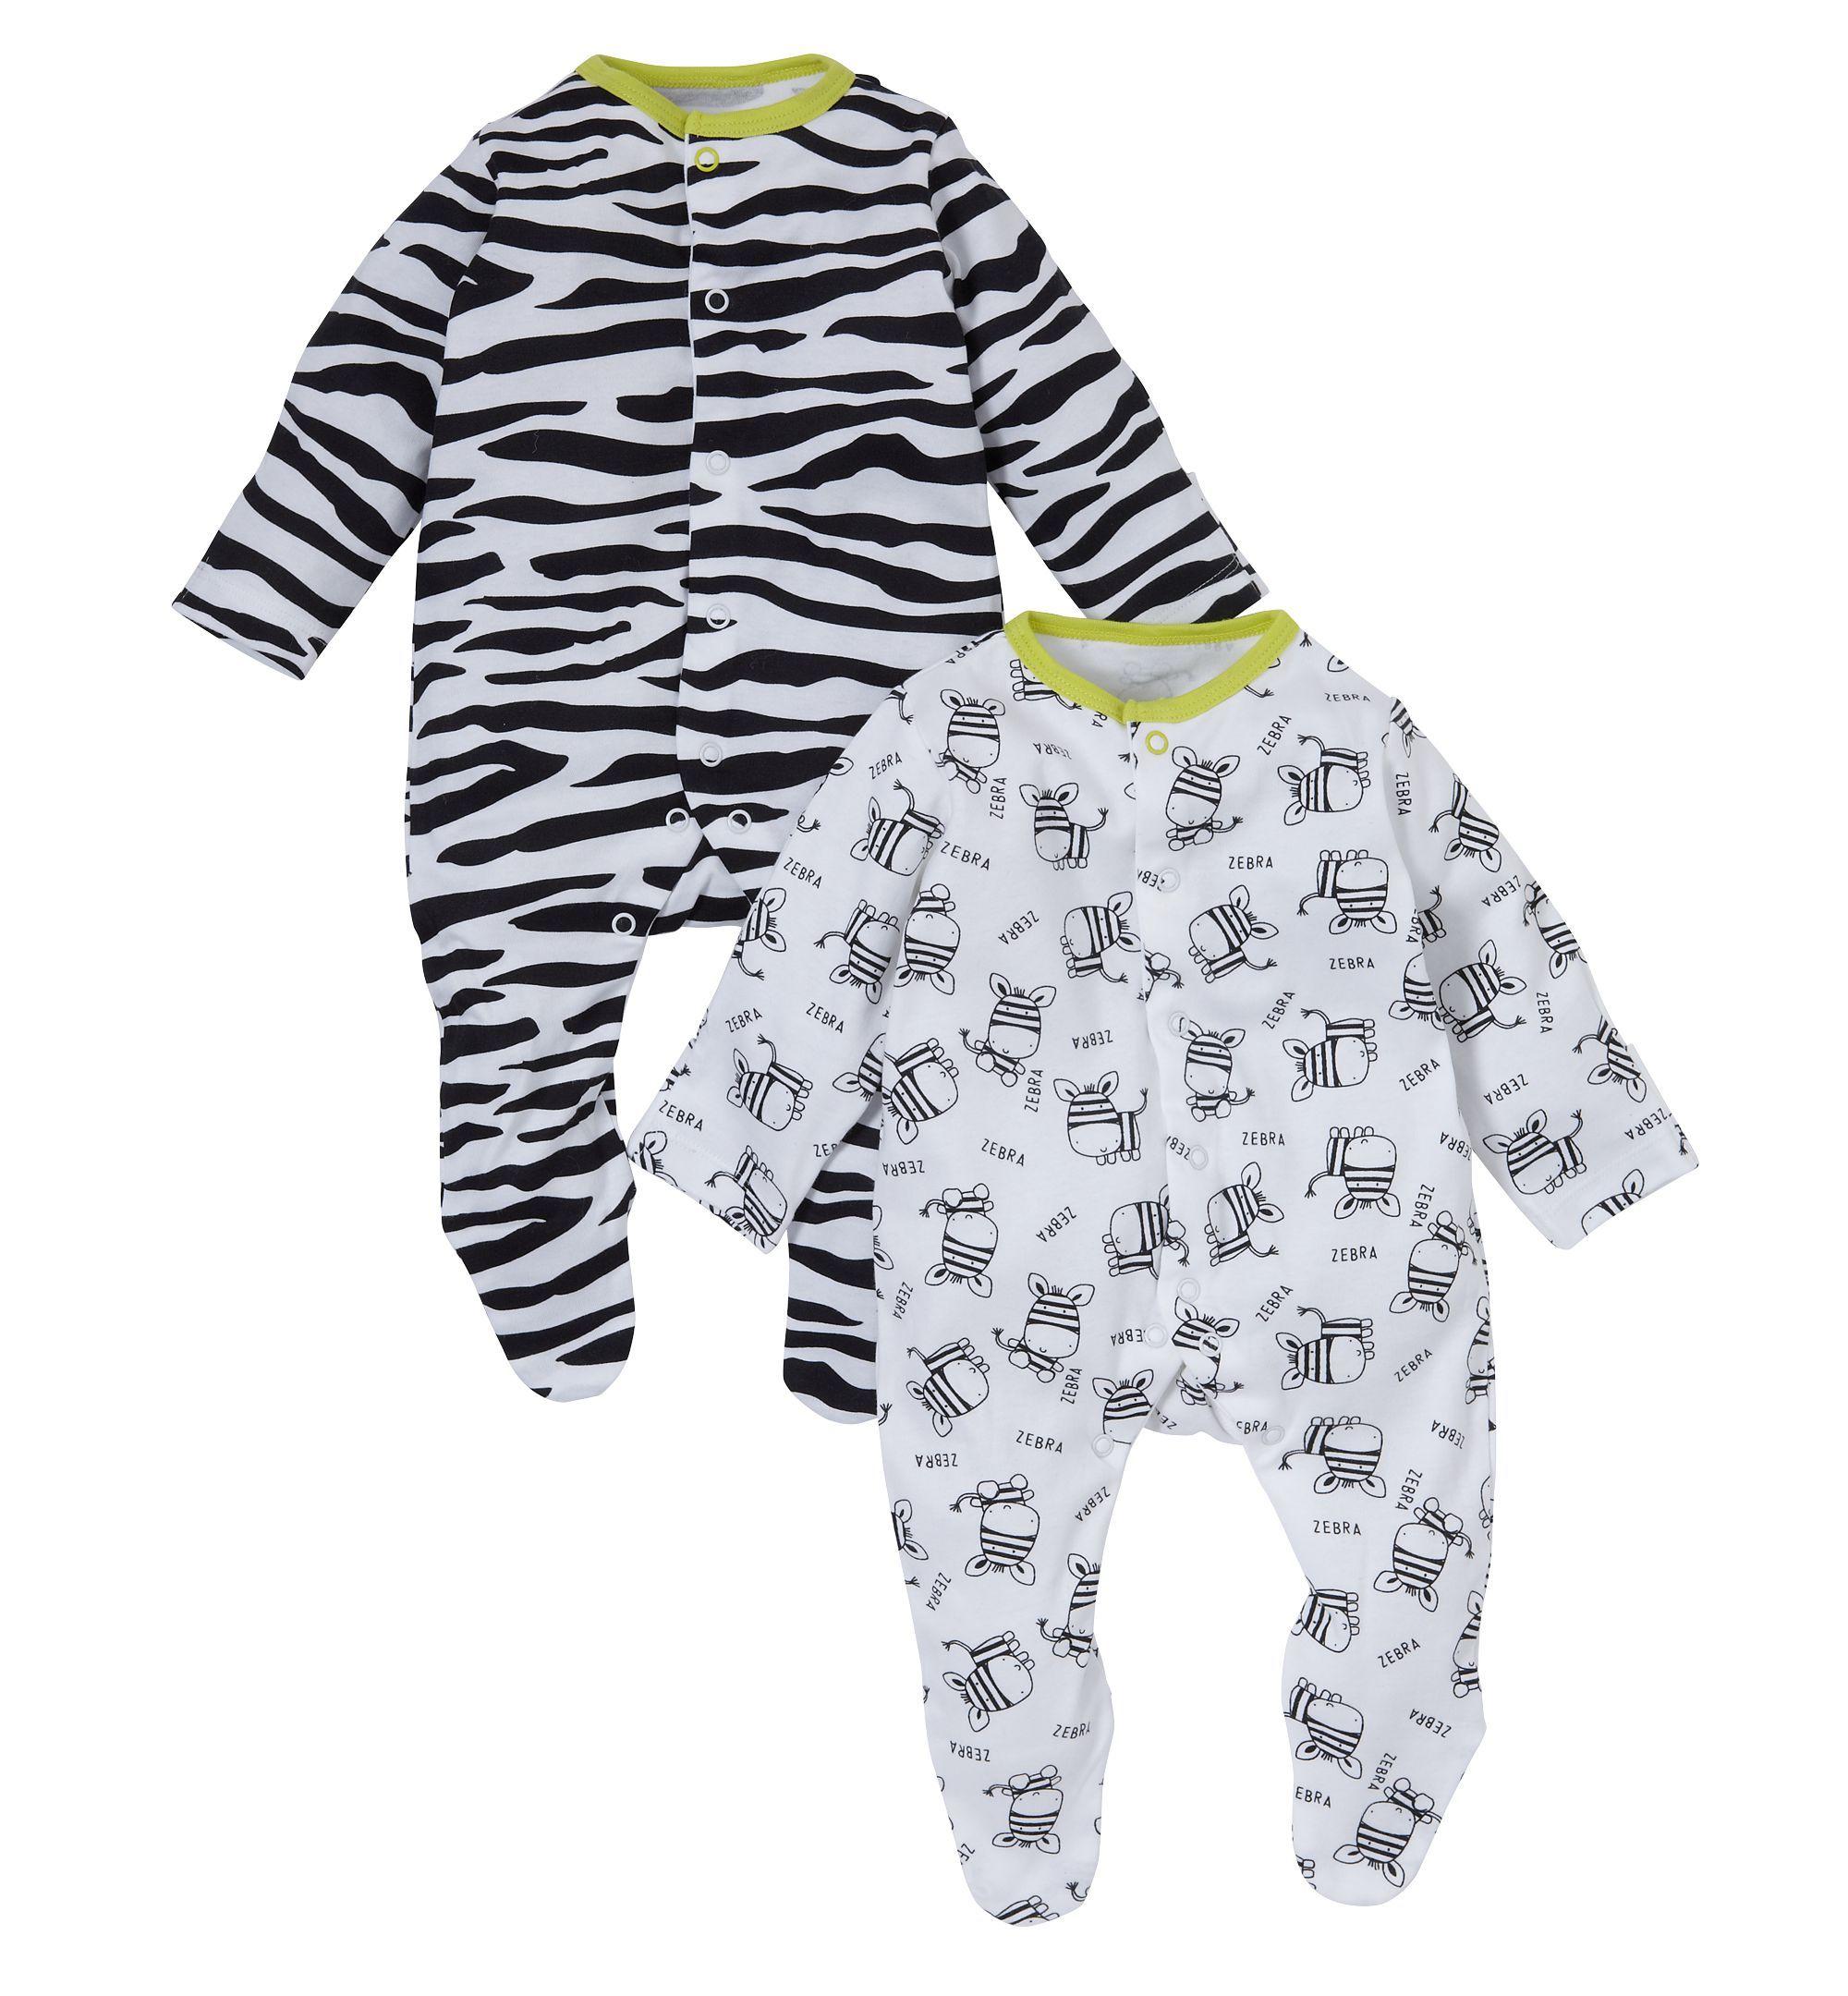 Mothercare Unisex Black and White Zebra Sleepsuits - 2 Pack  fb259f13e